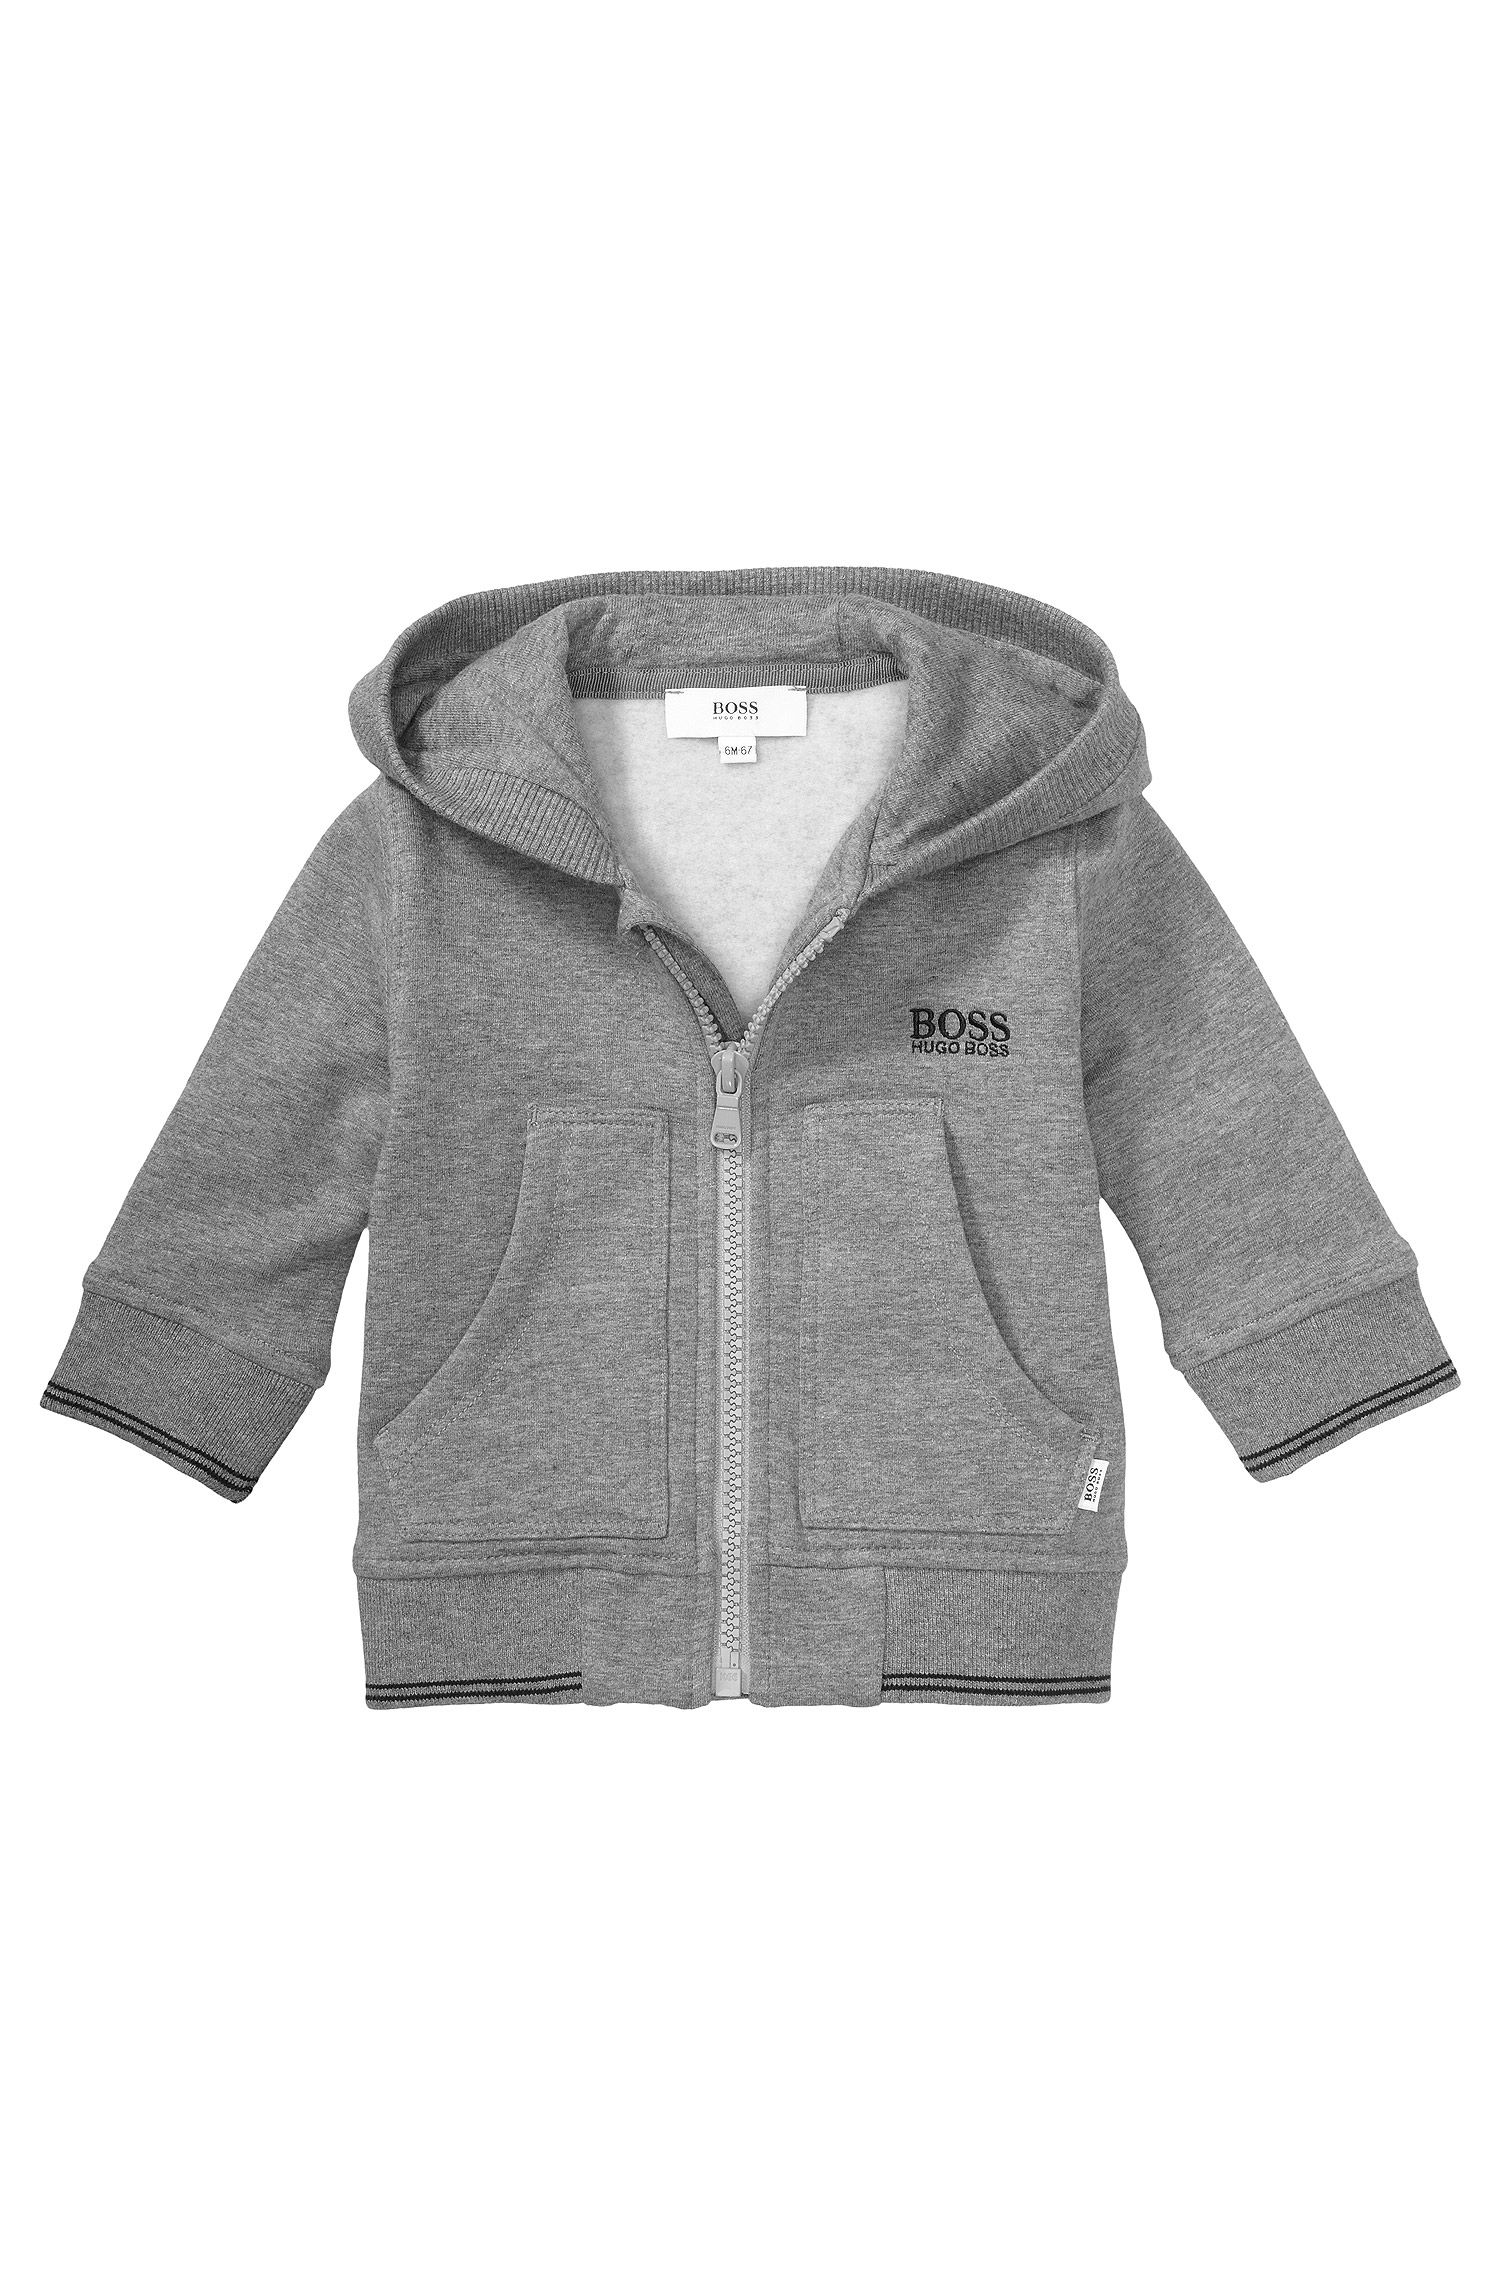 Kids-Sweatshirt-Jacke ´J05323` aus Baumwoll-Mix